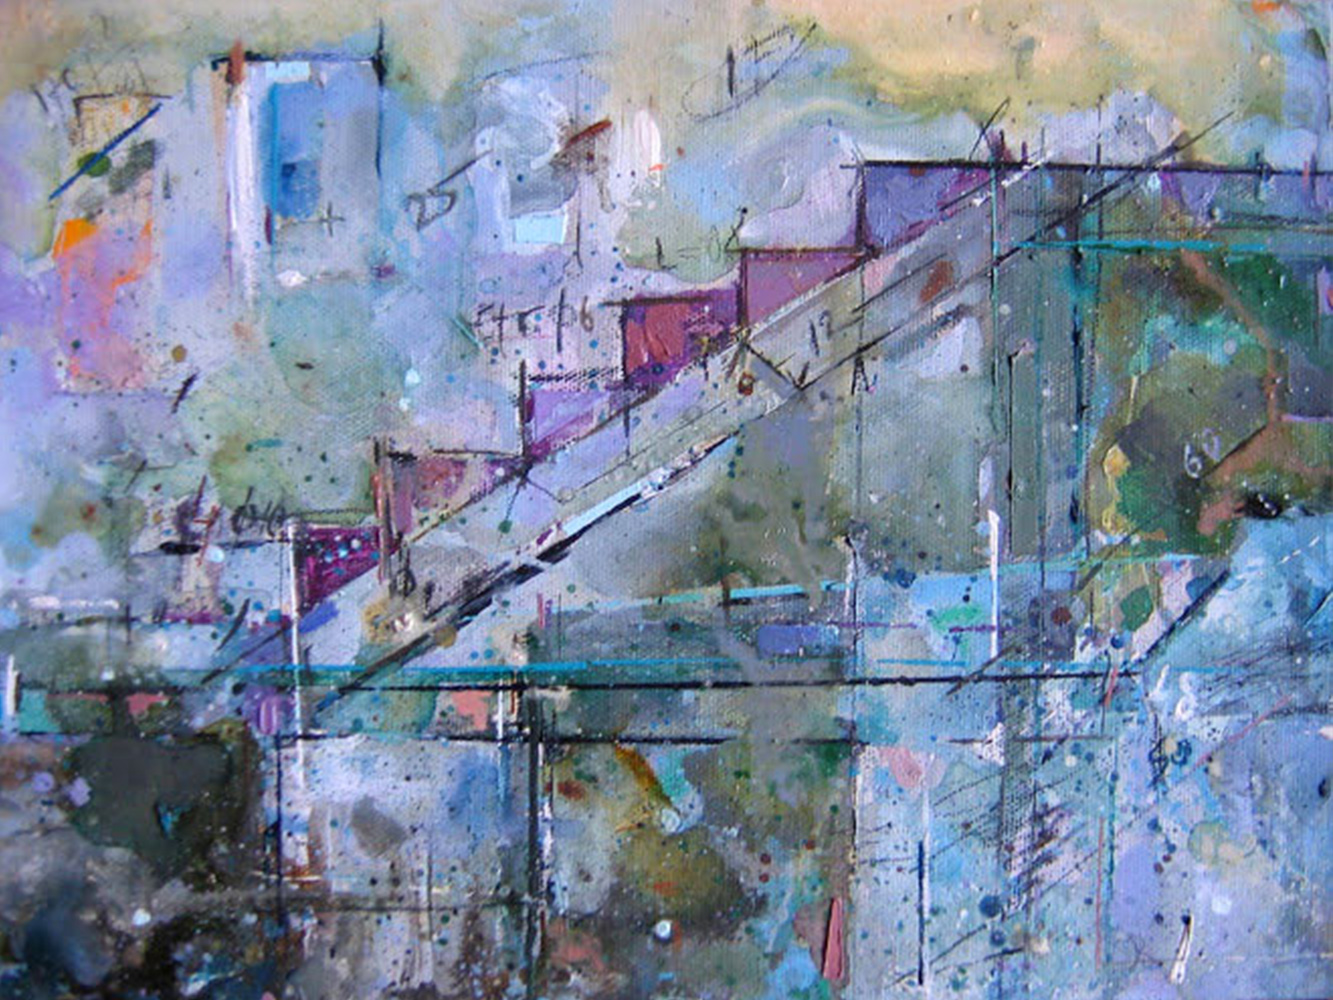 Building-Material-13-1